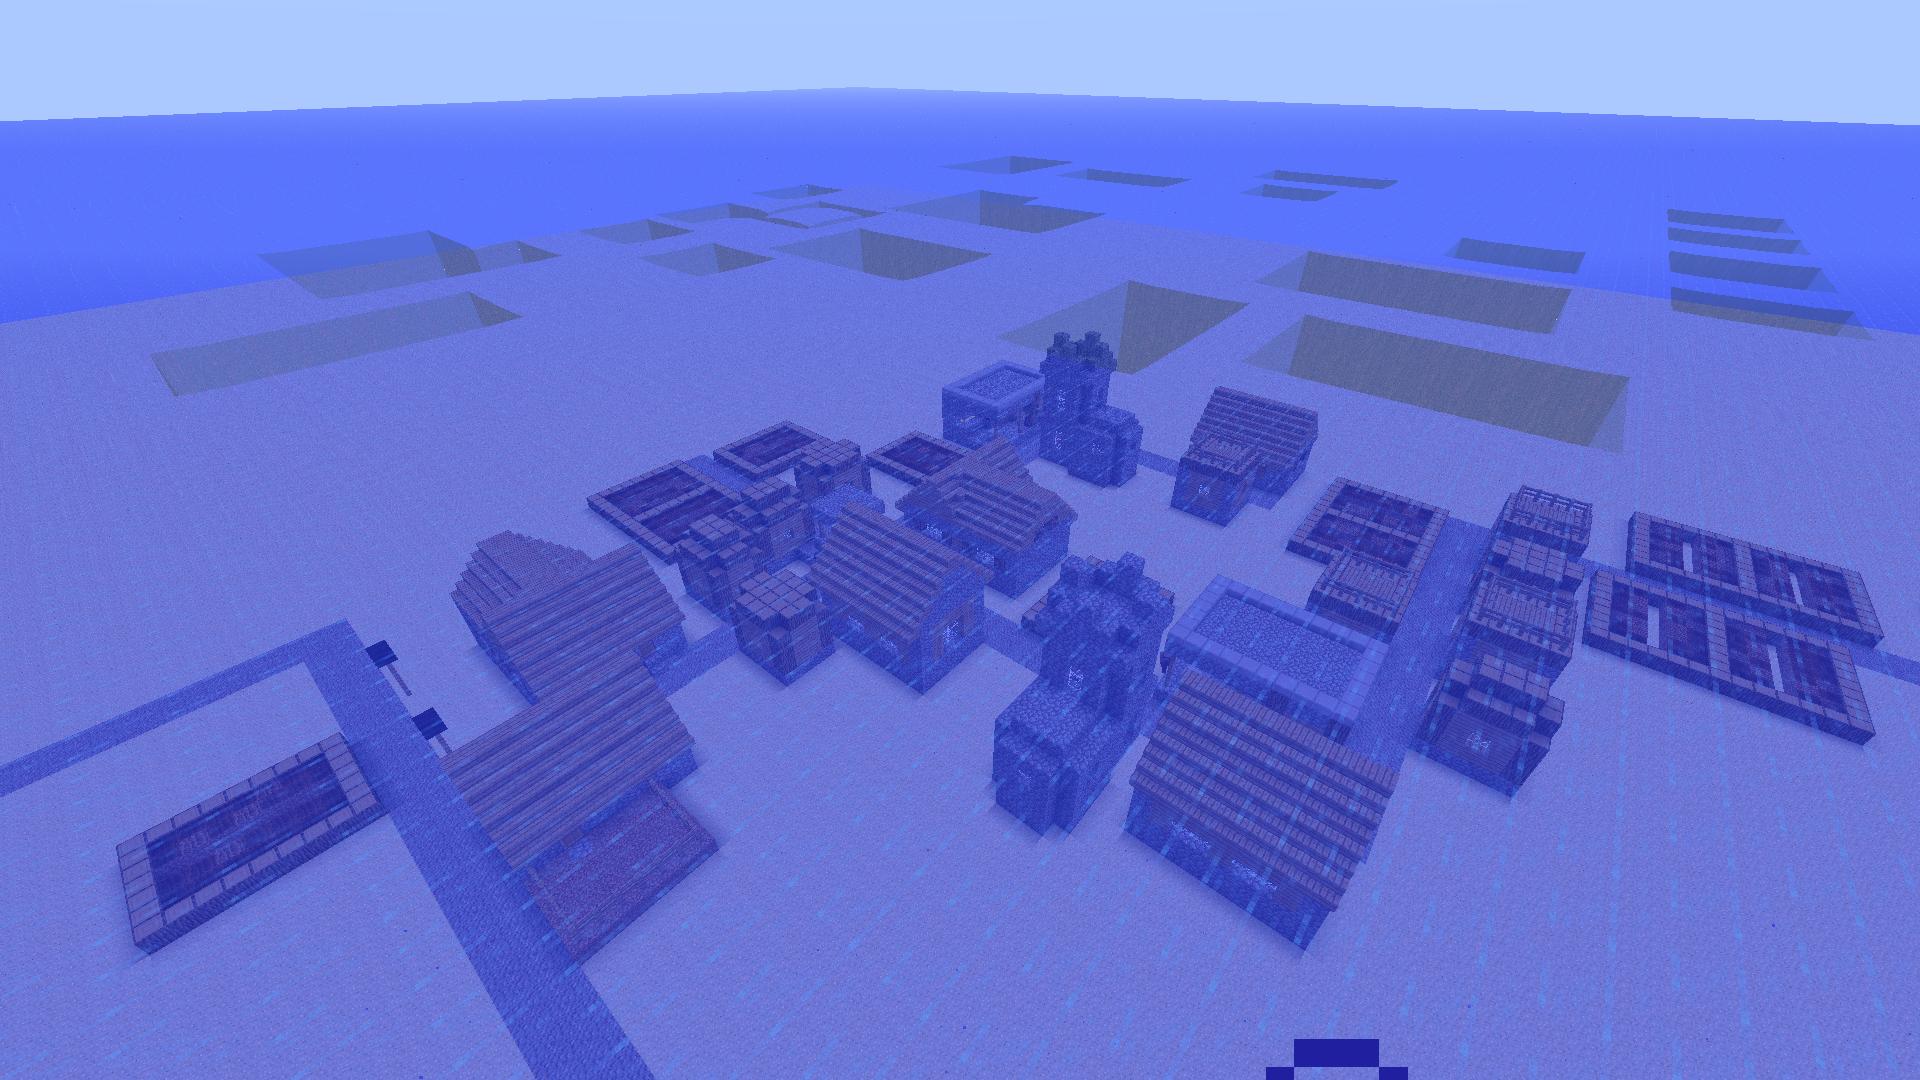 wft minecraft. go home Minecraft you are drunk.